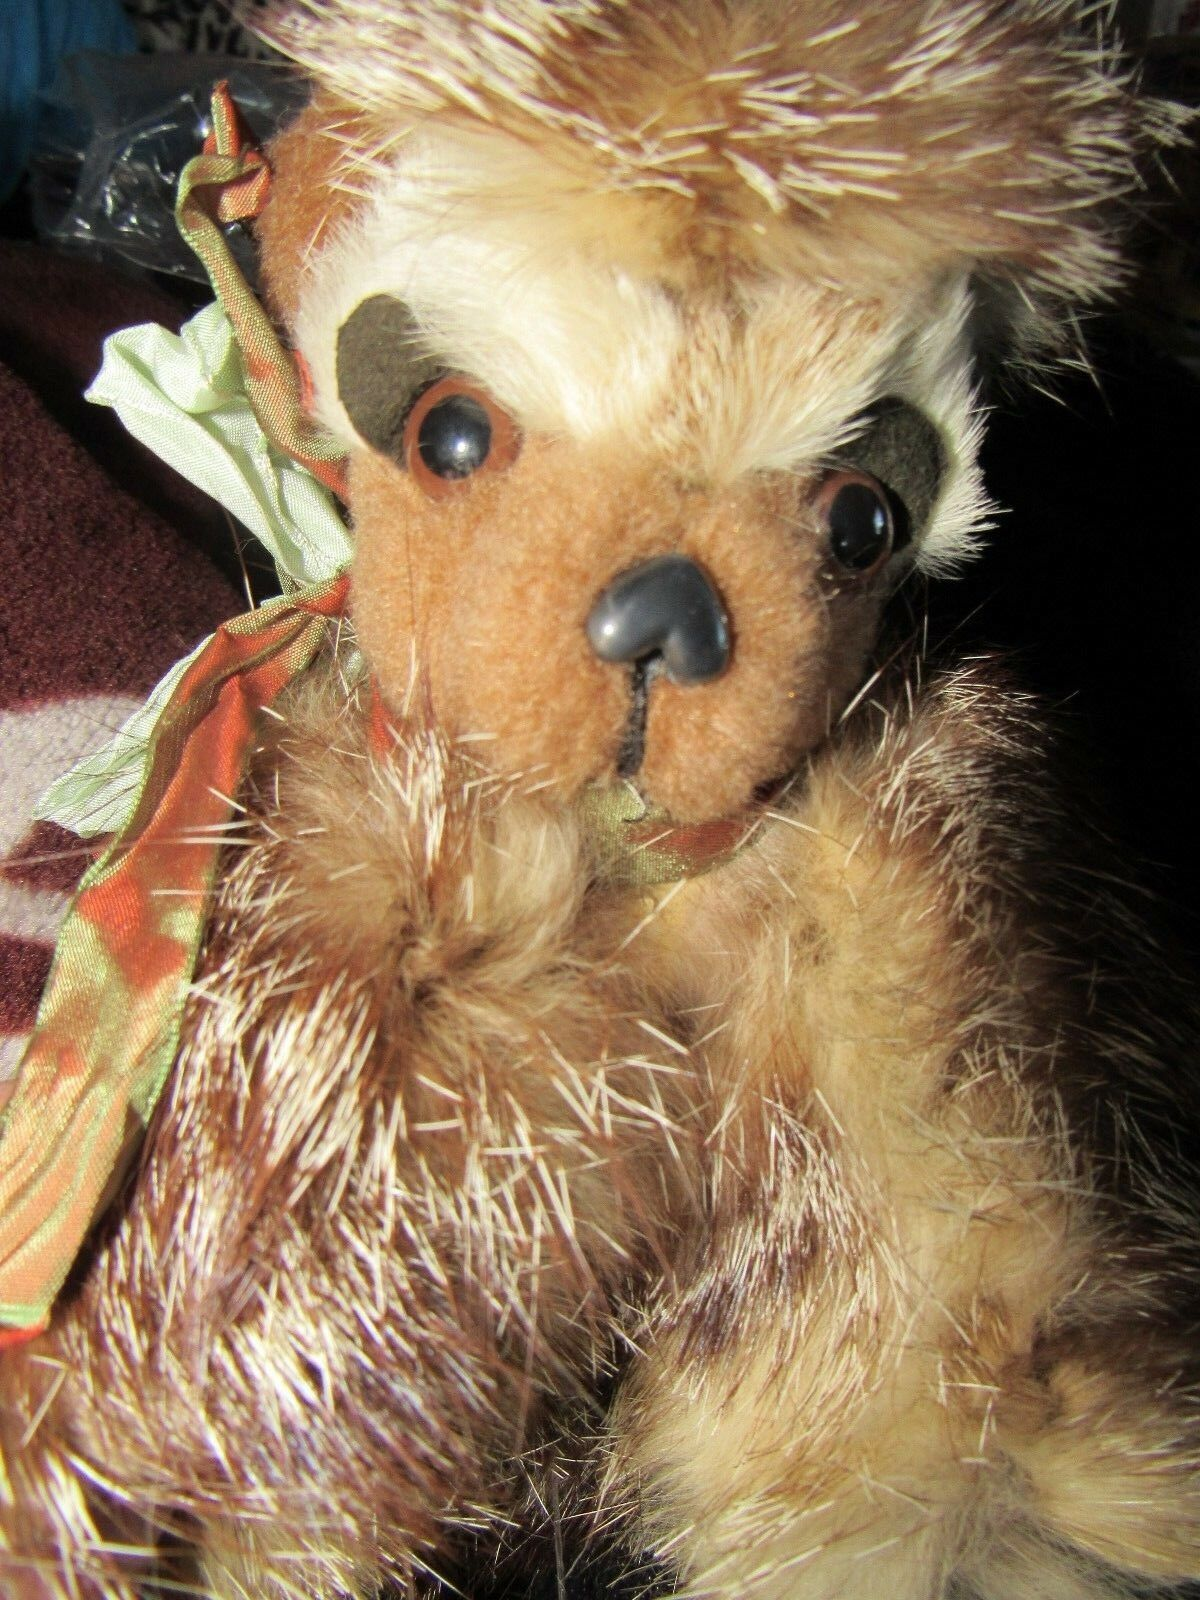 VINTAGE 9  REAL FOX FOX FOX FUR TEDDY orso OOAK ORIGINAL ARTIST S TAUBER RARE PUPPY DOG bdad5c